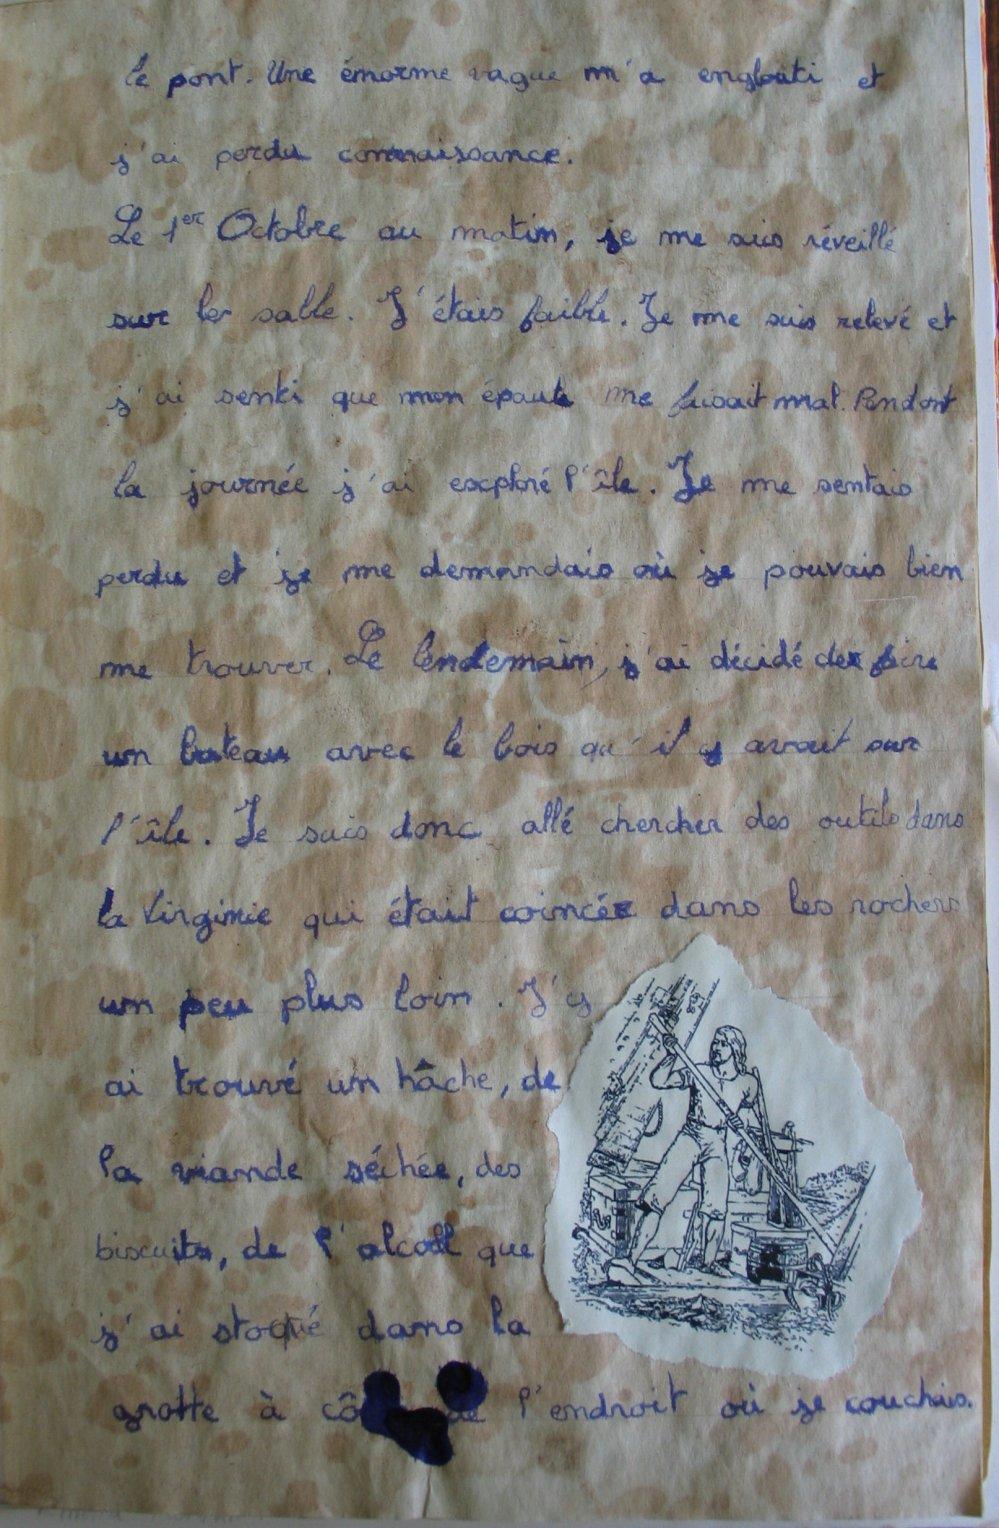 historique rencontre ac milan fiorentina Arras